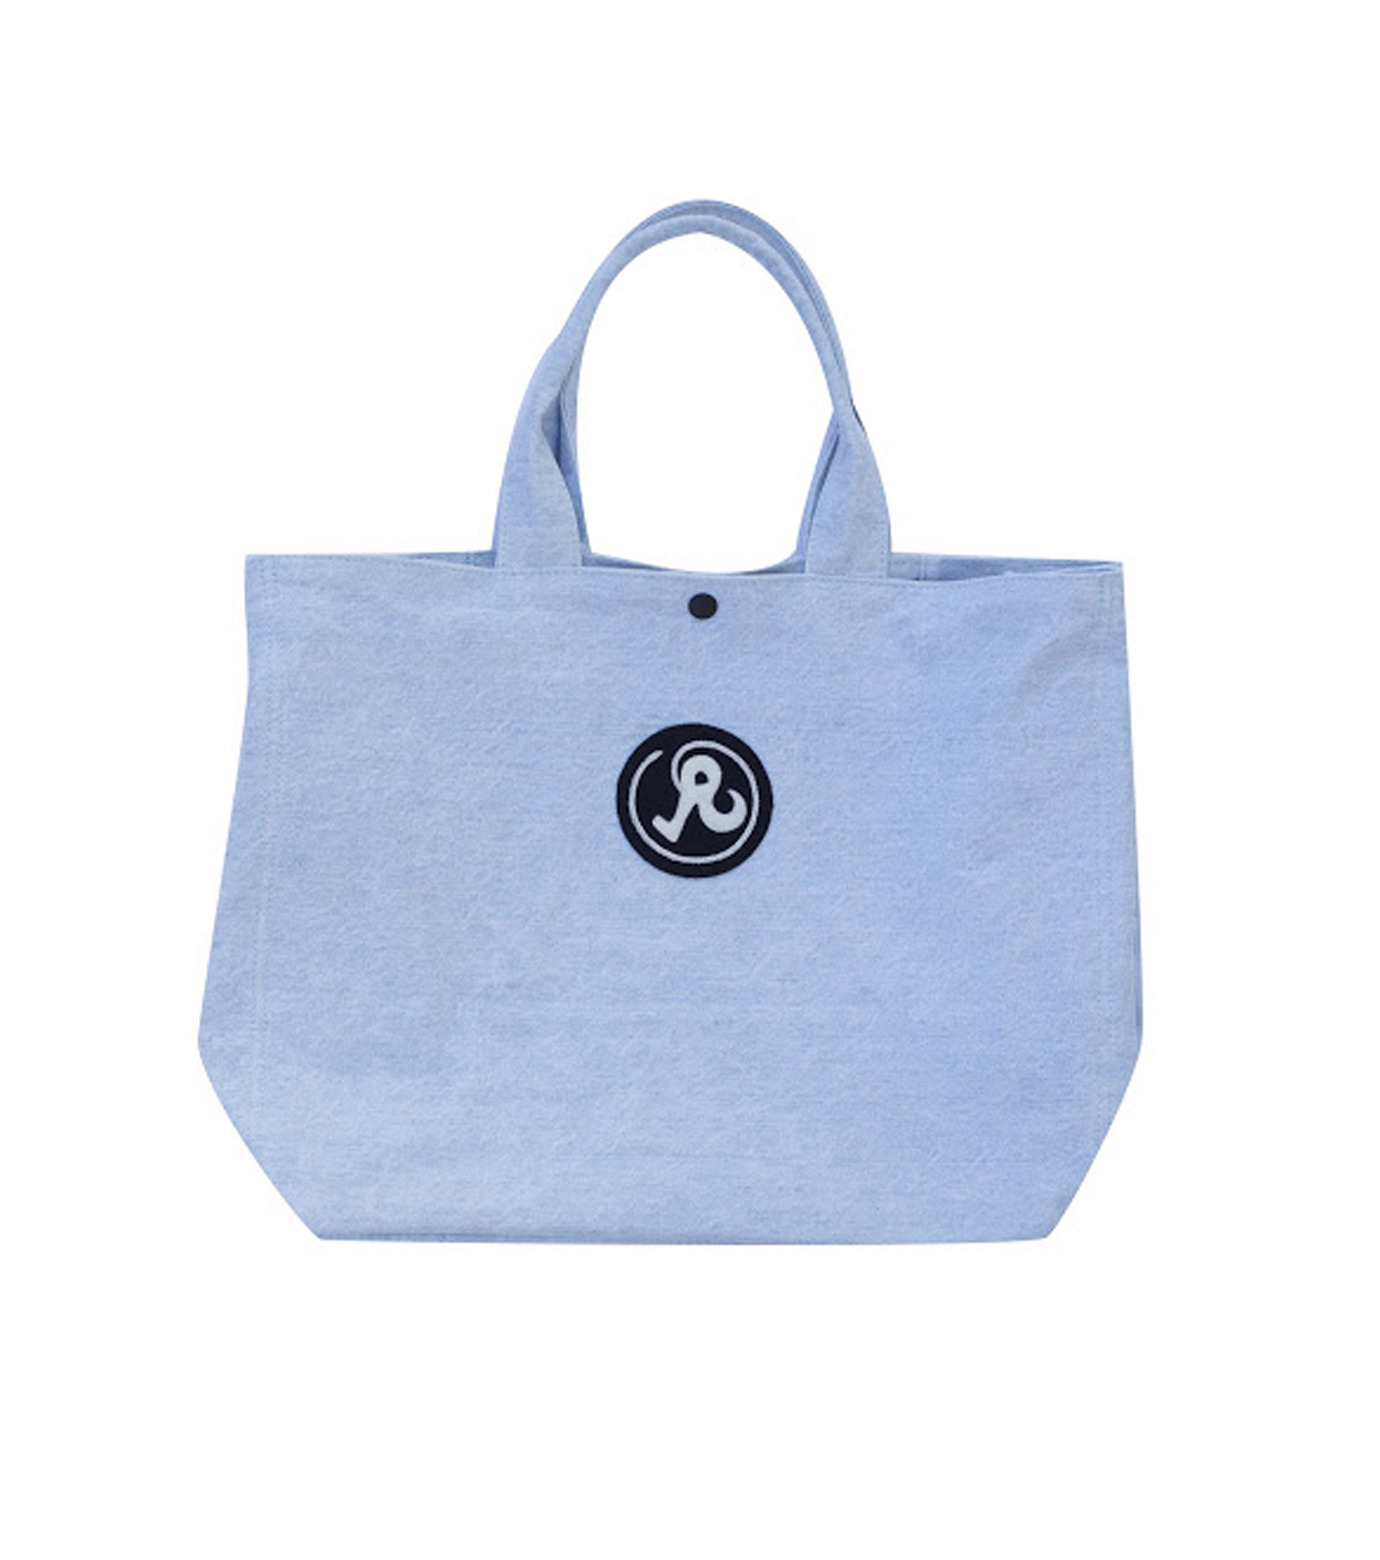 Richardson Magazine(リチャードソン マガジン)のDenim Tote-BLUE(ハンドバッグ/hand bag)-AW16011-92 拡大詳細画像1